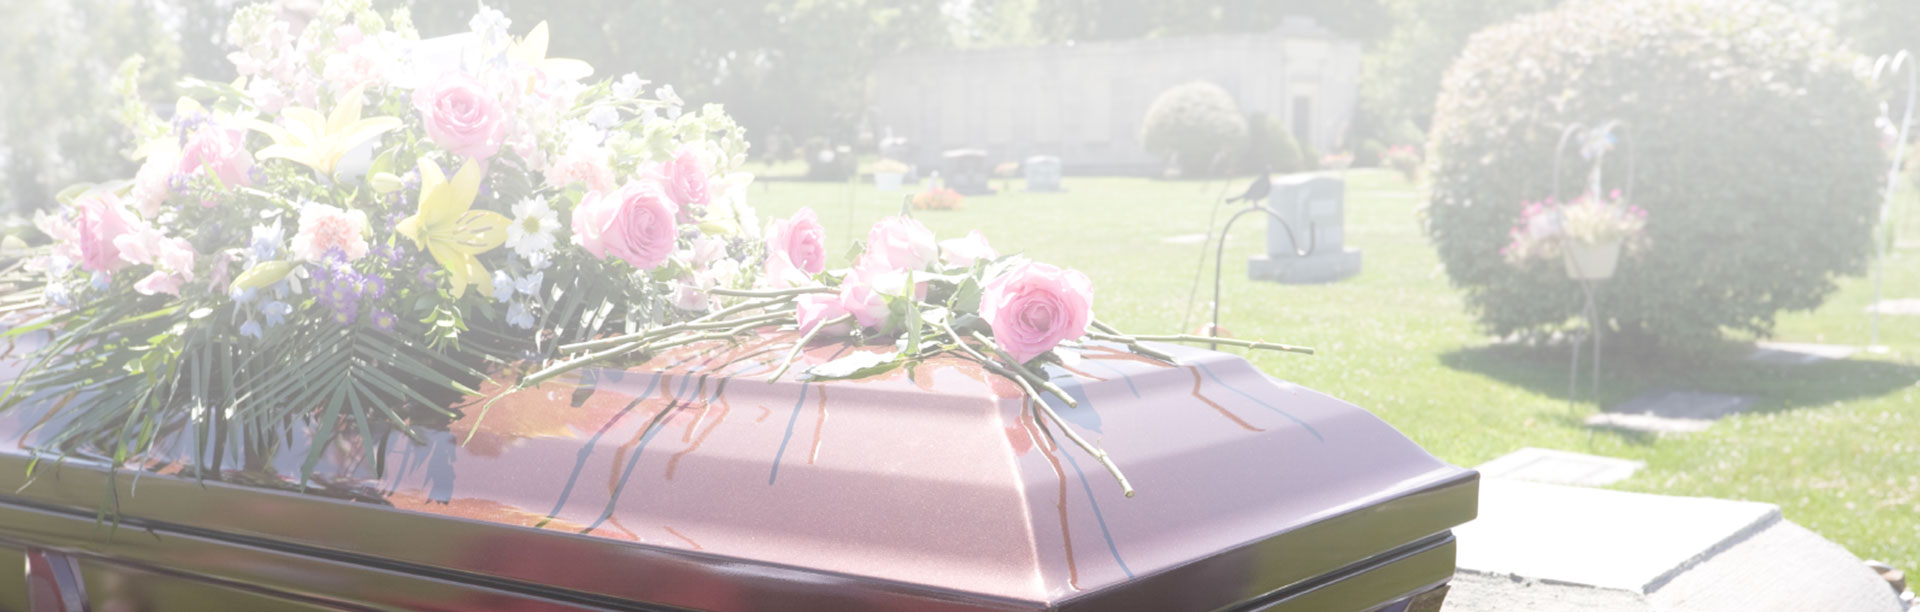 servicii funerare sector 4